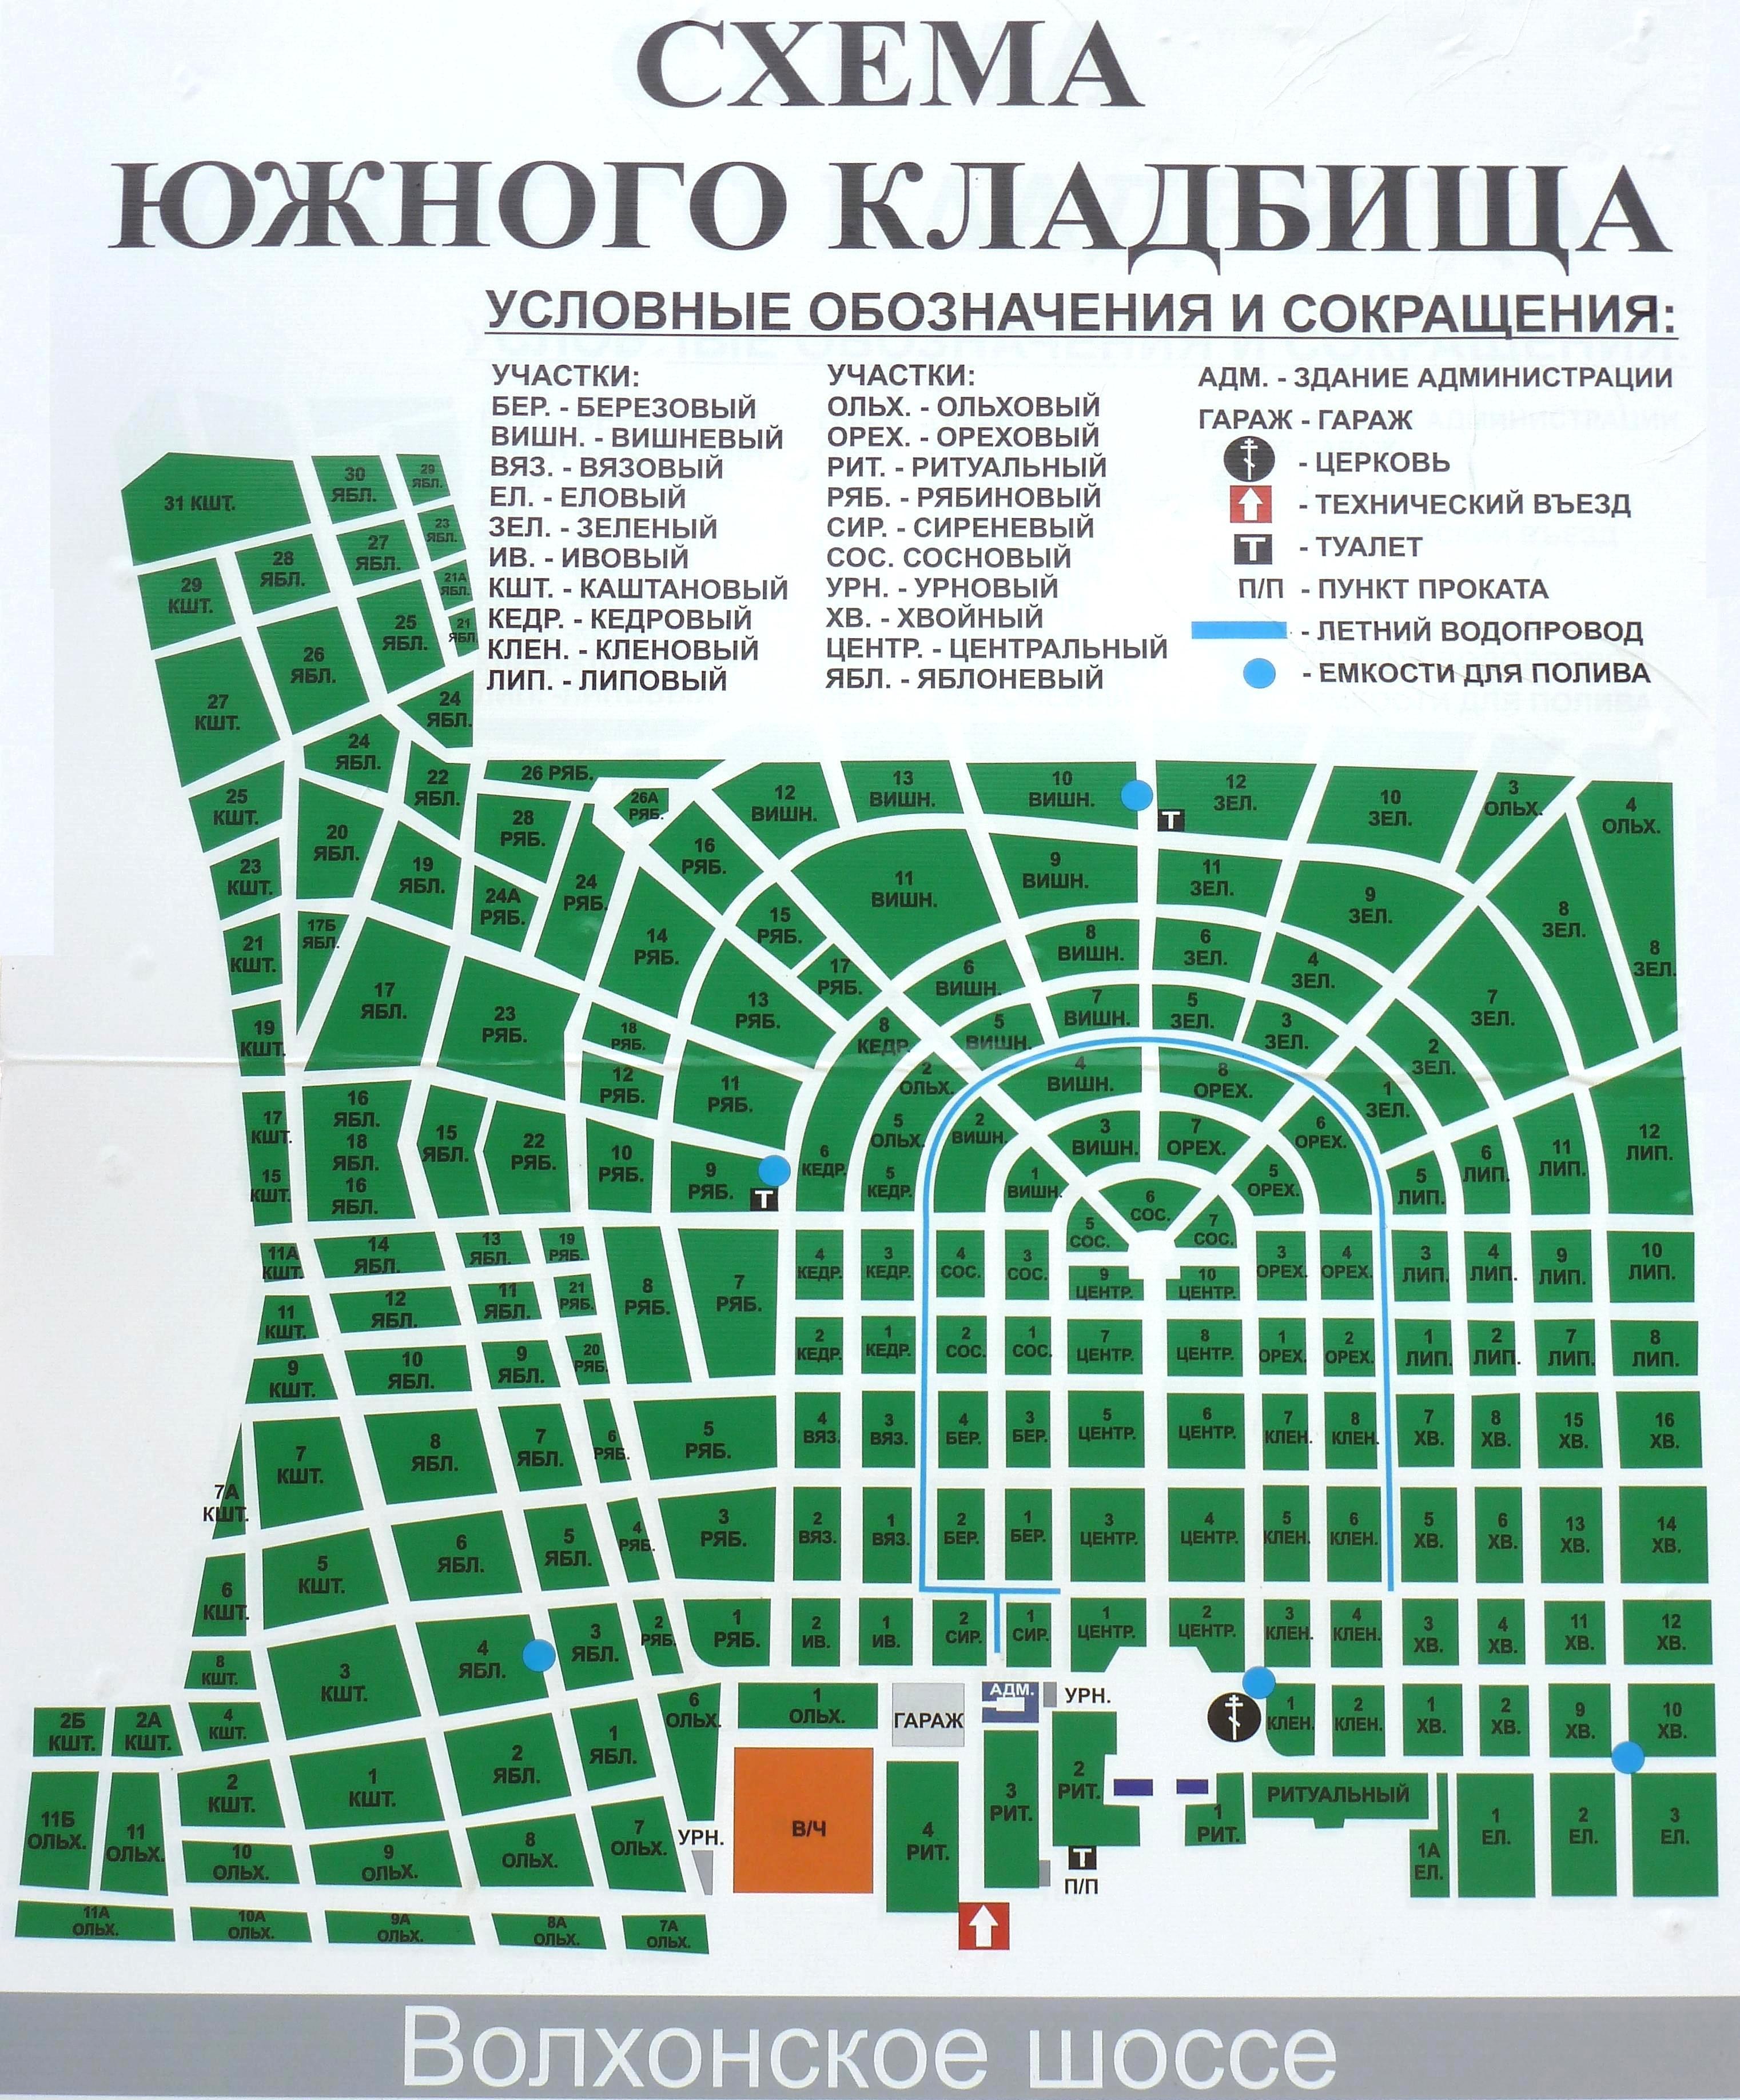 Схема хованского кладбища участки